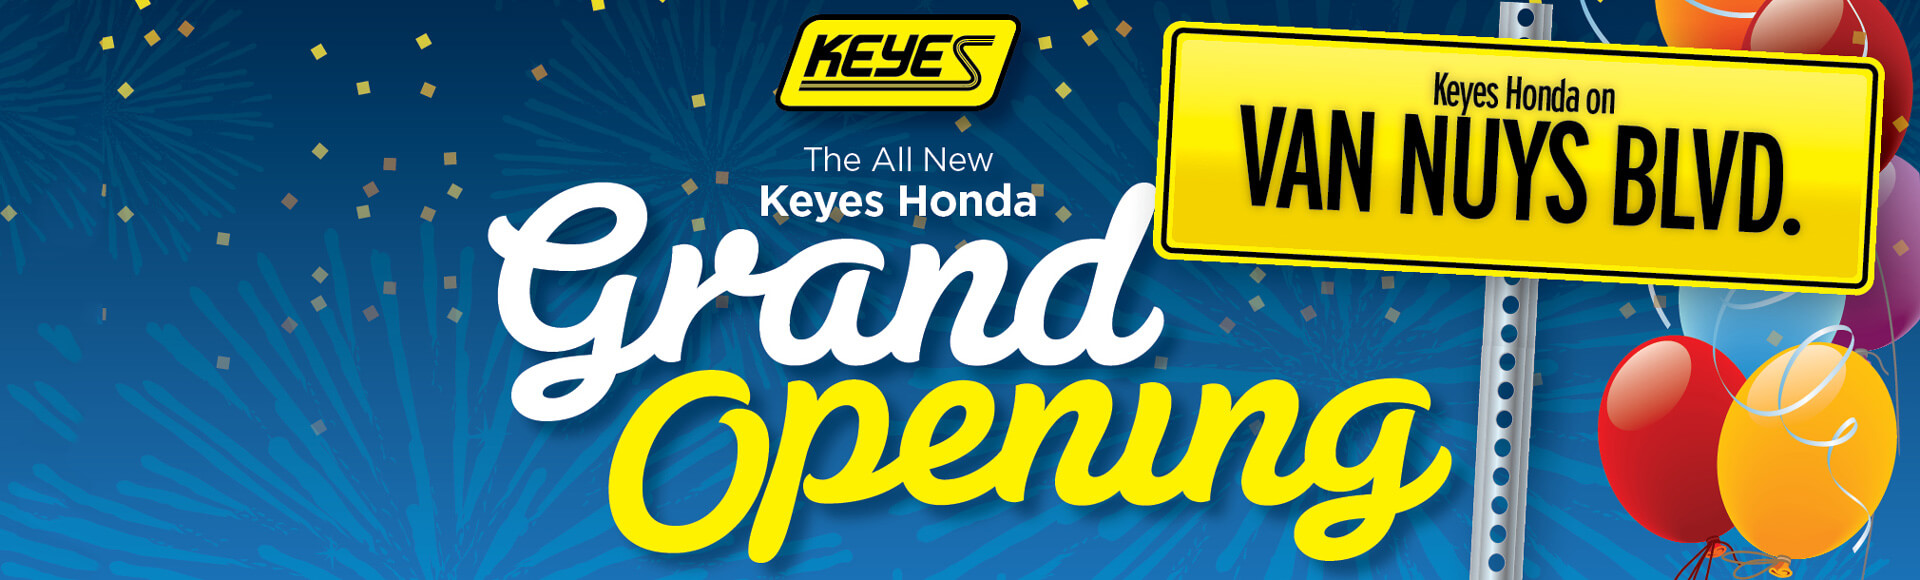 Keyes Honda - Grand Opening